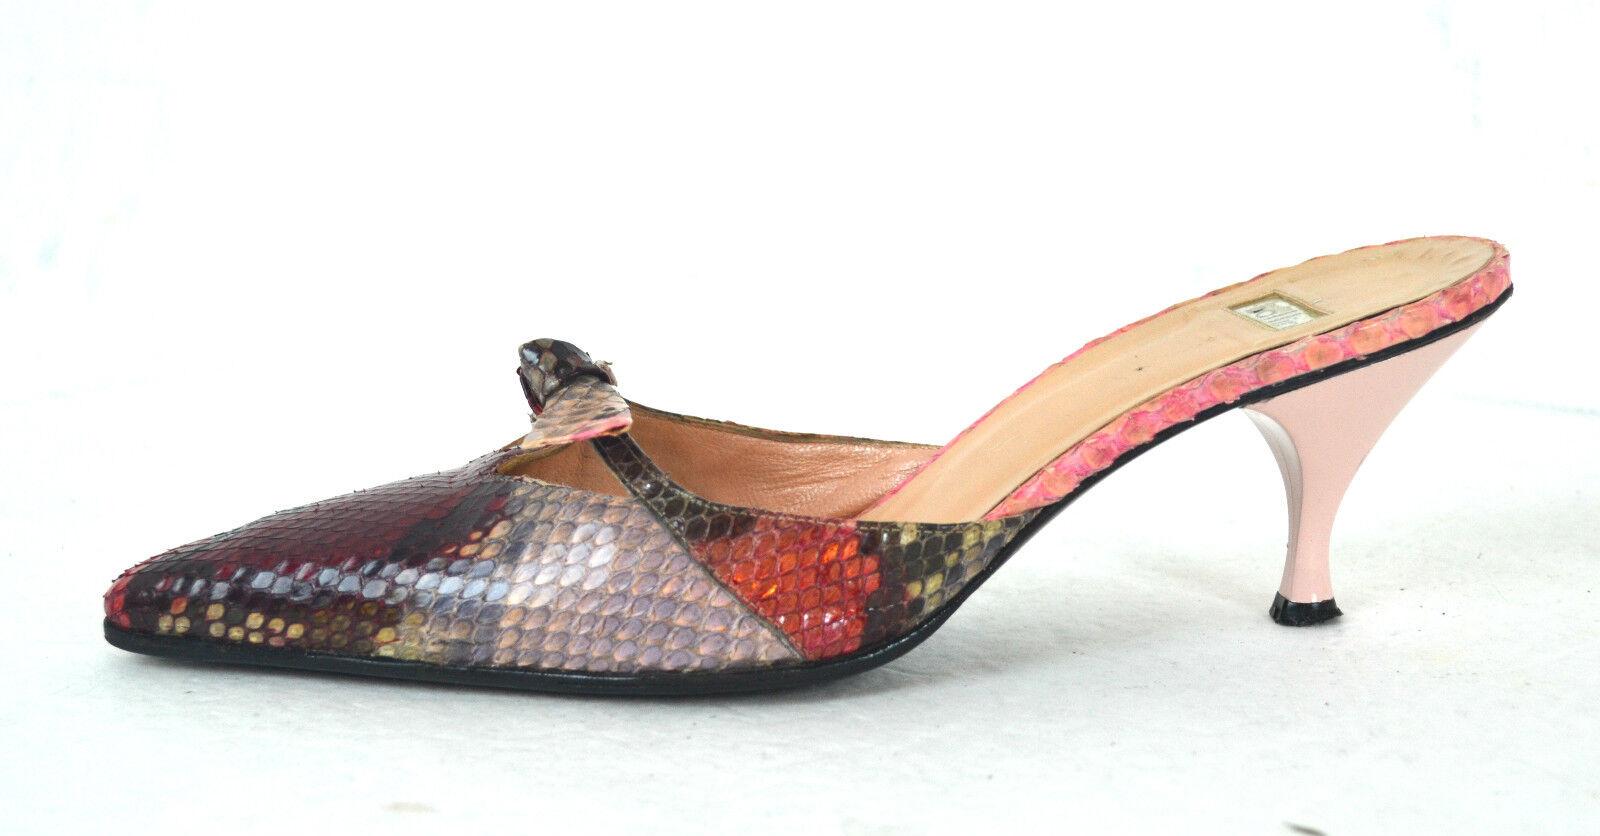 ELEGANT BALLIN ROT GENUINE SNAKESKIN LEATHER Schuhe SIZE 7.5 / 38 MADE IN ITALY